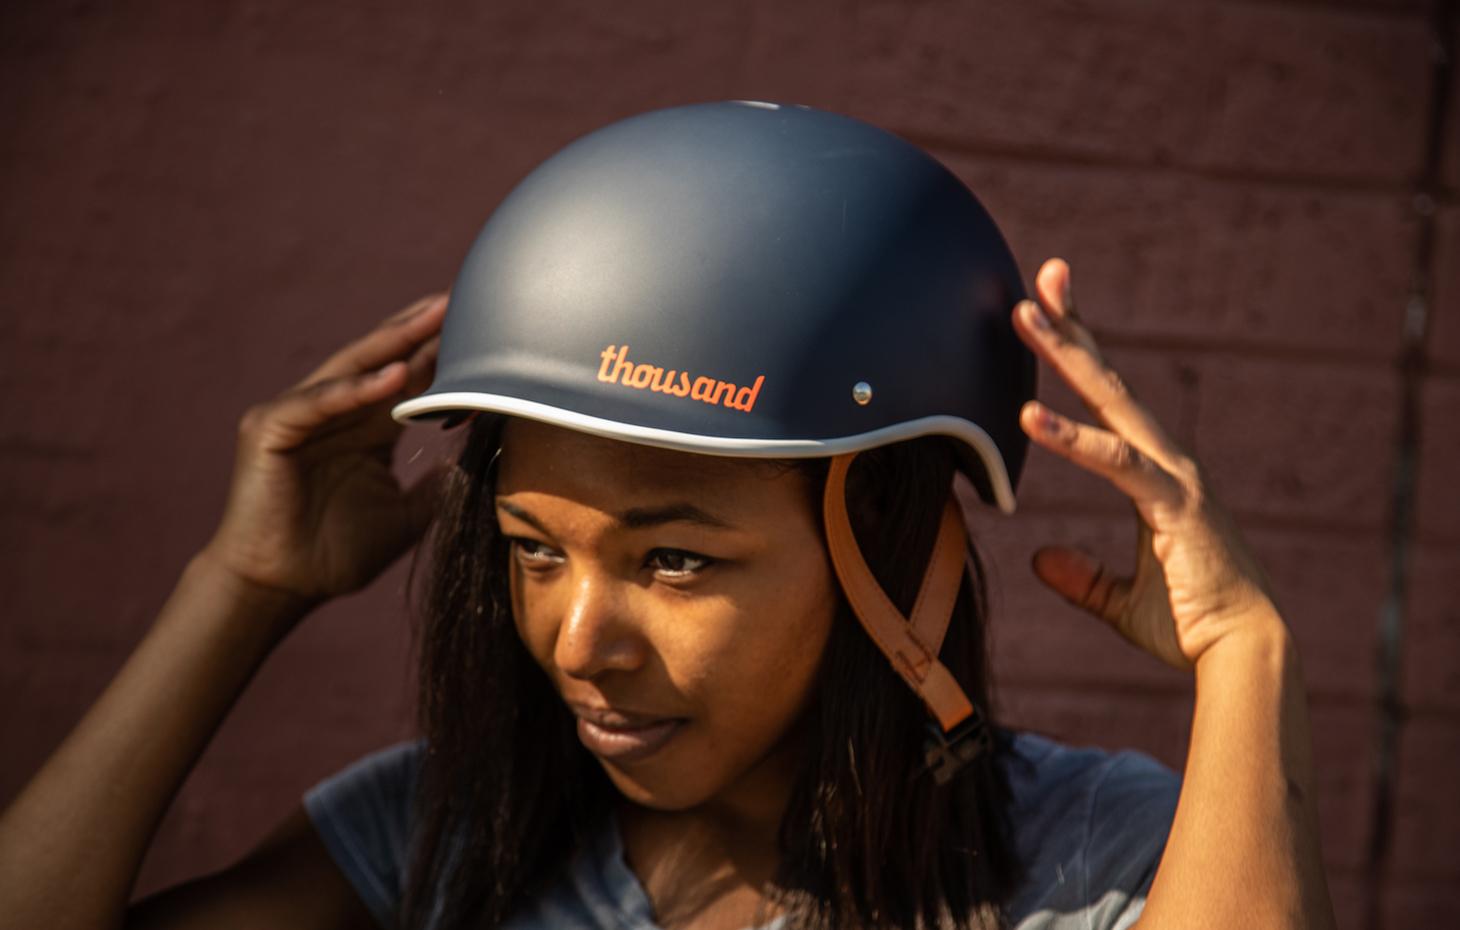 Blue bike helmet